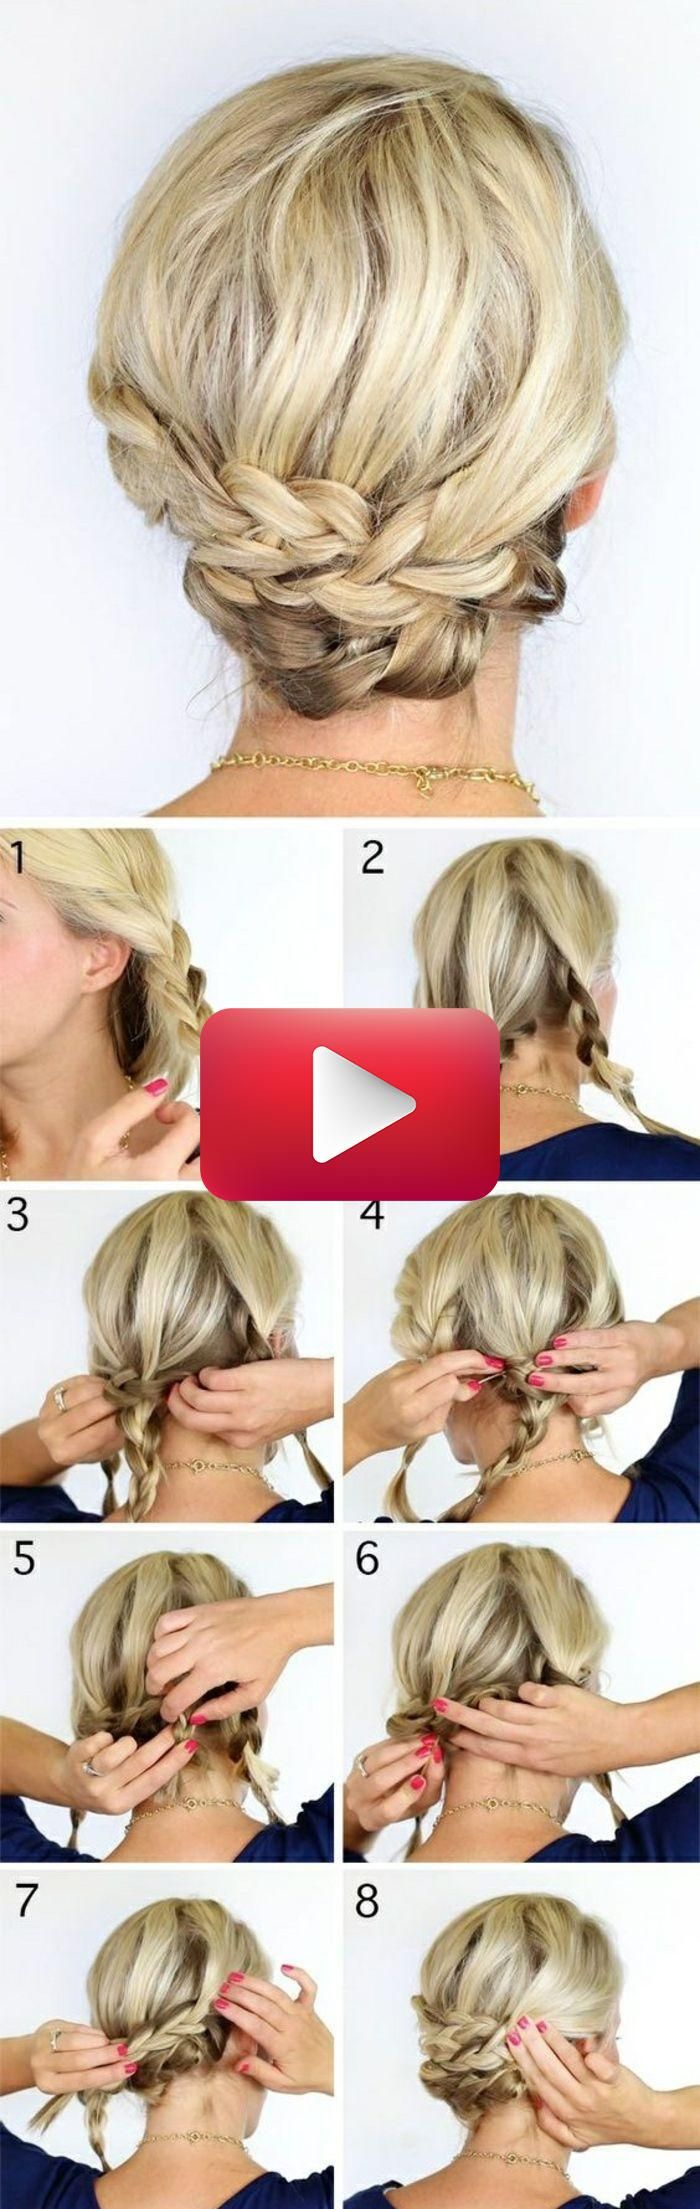 1001 Ideen Und Anleitungen Wie Sie Flechtfrisuren Selber Machen Konnen Hair Styl In 2020 Flechtfrisuren Geflochtene Frisuren Geflochtene Frisuren Fur Kurze Haare